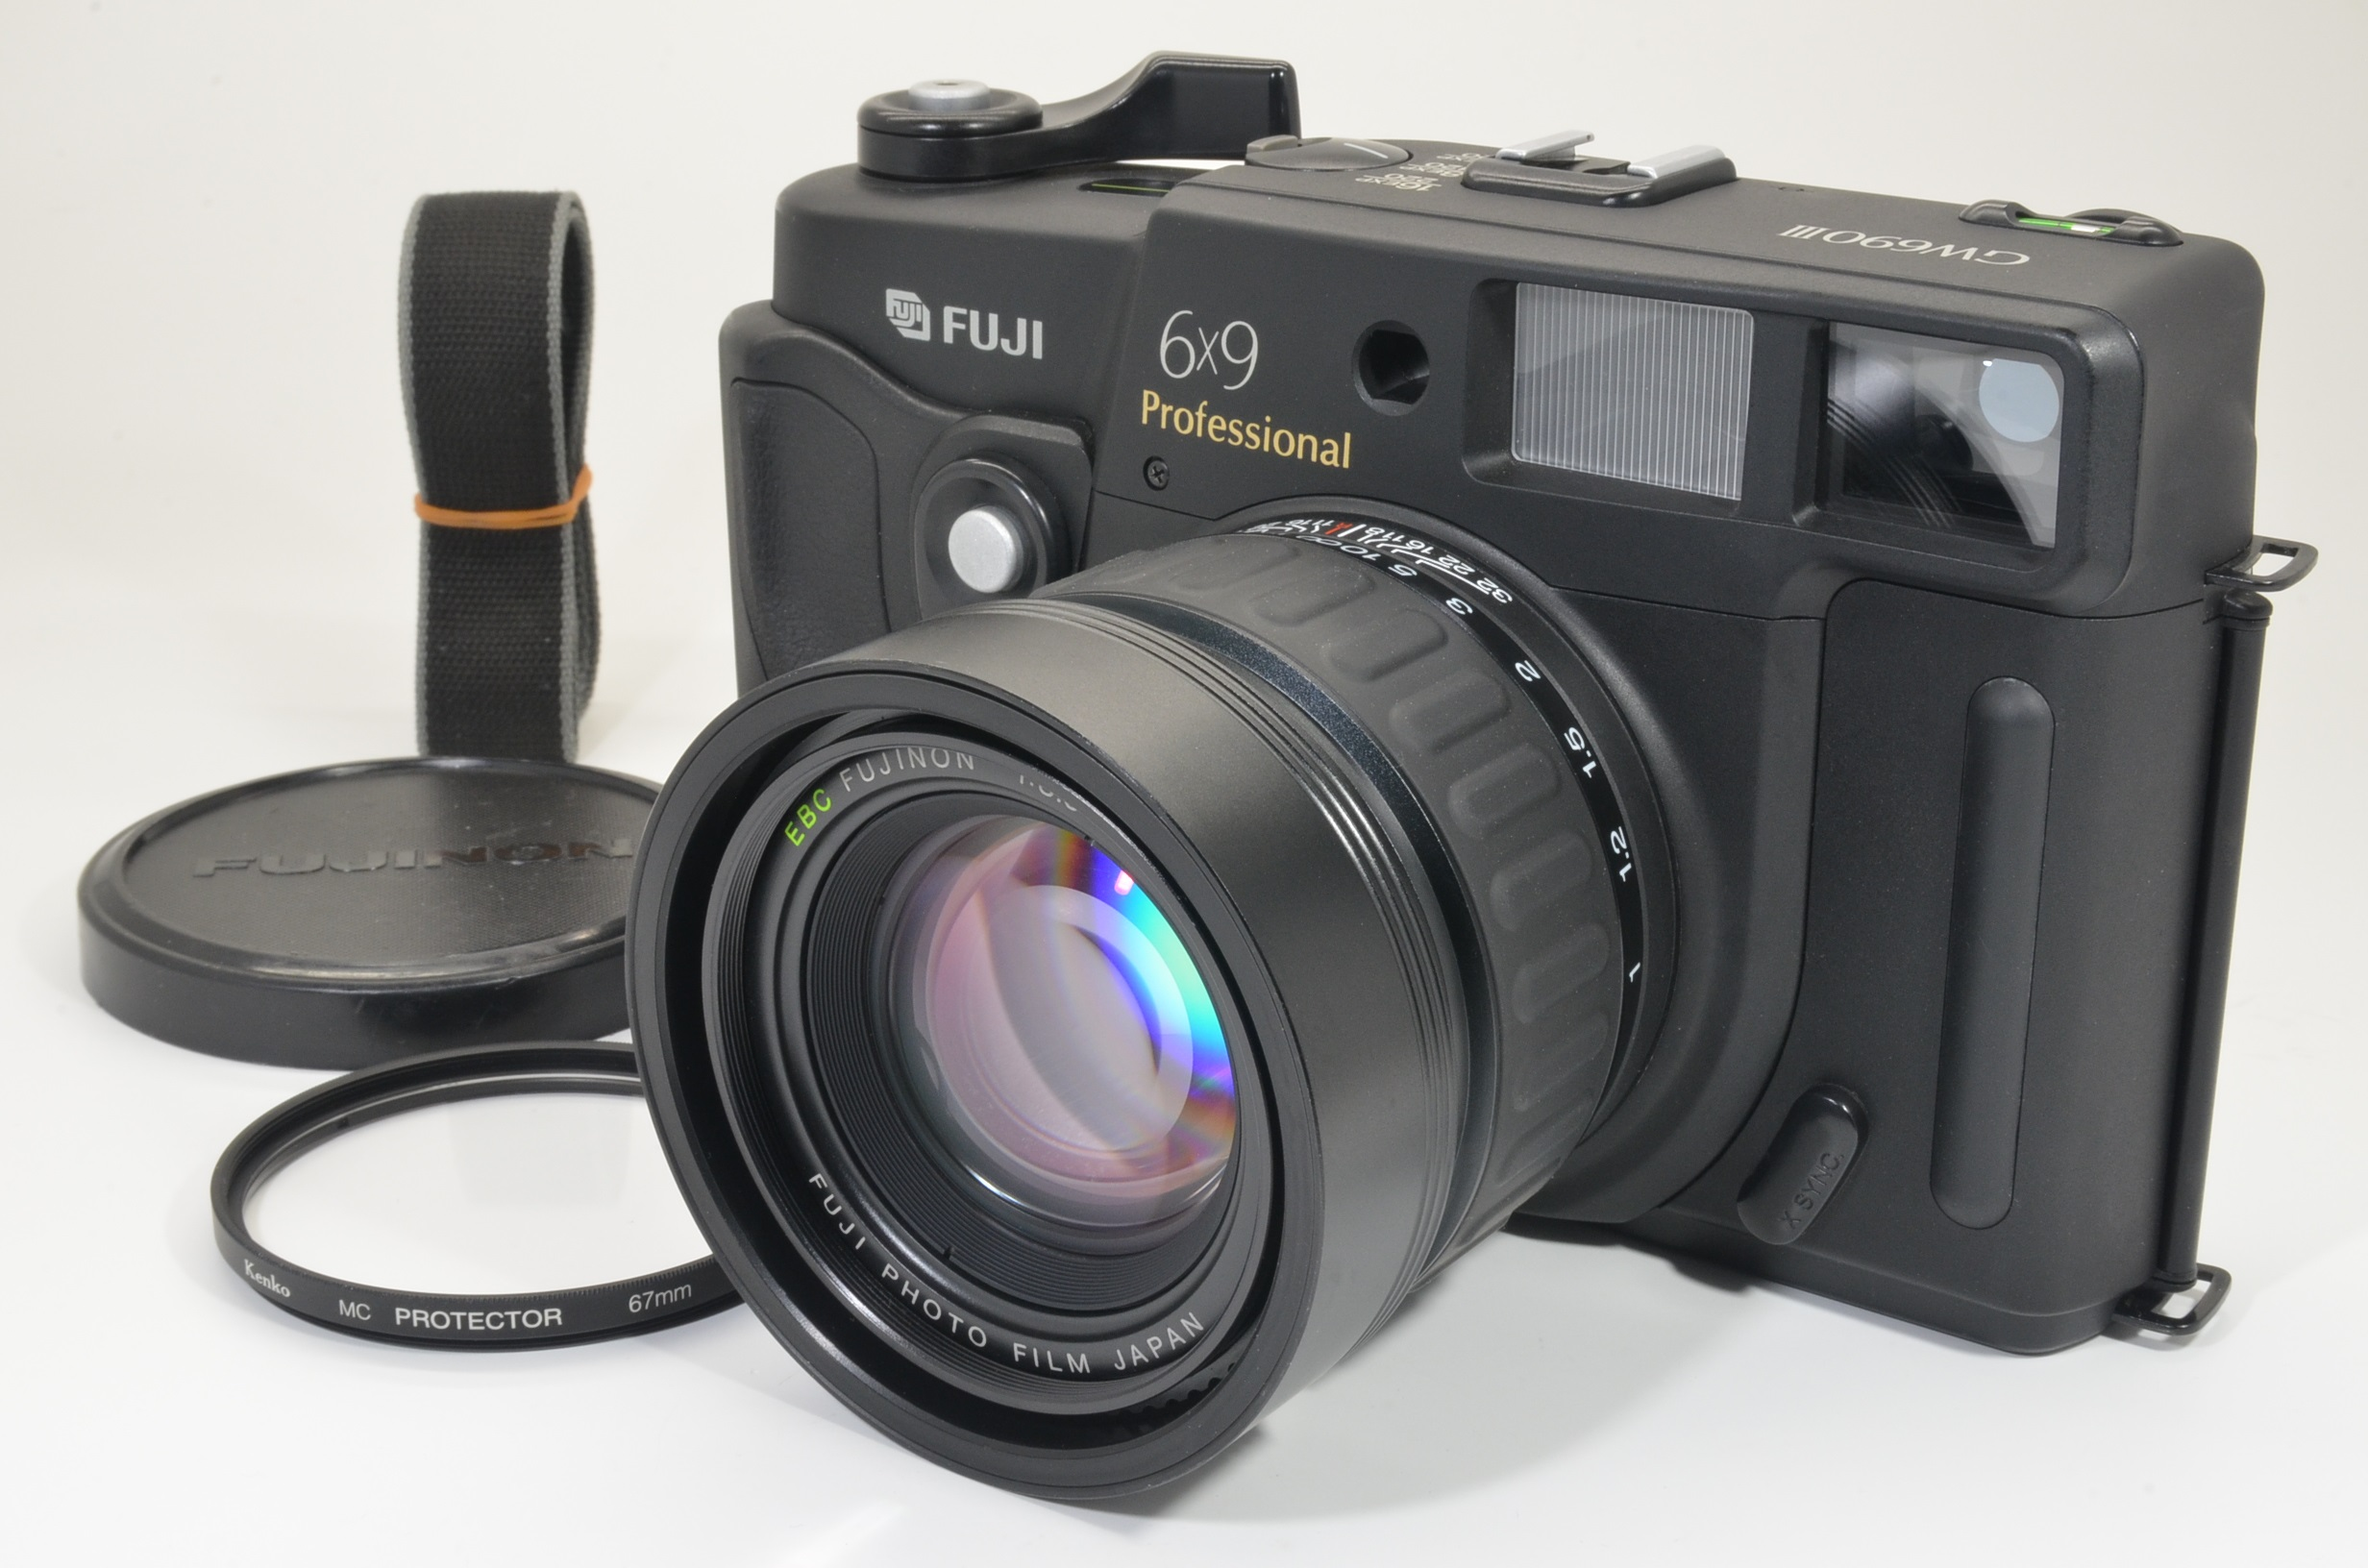 fuji fujifilm gw690iii 90mm f3.5 6x9 medium format camera count 274 film tested